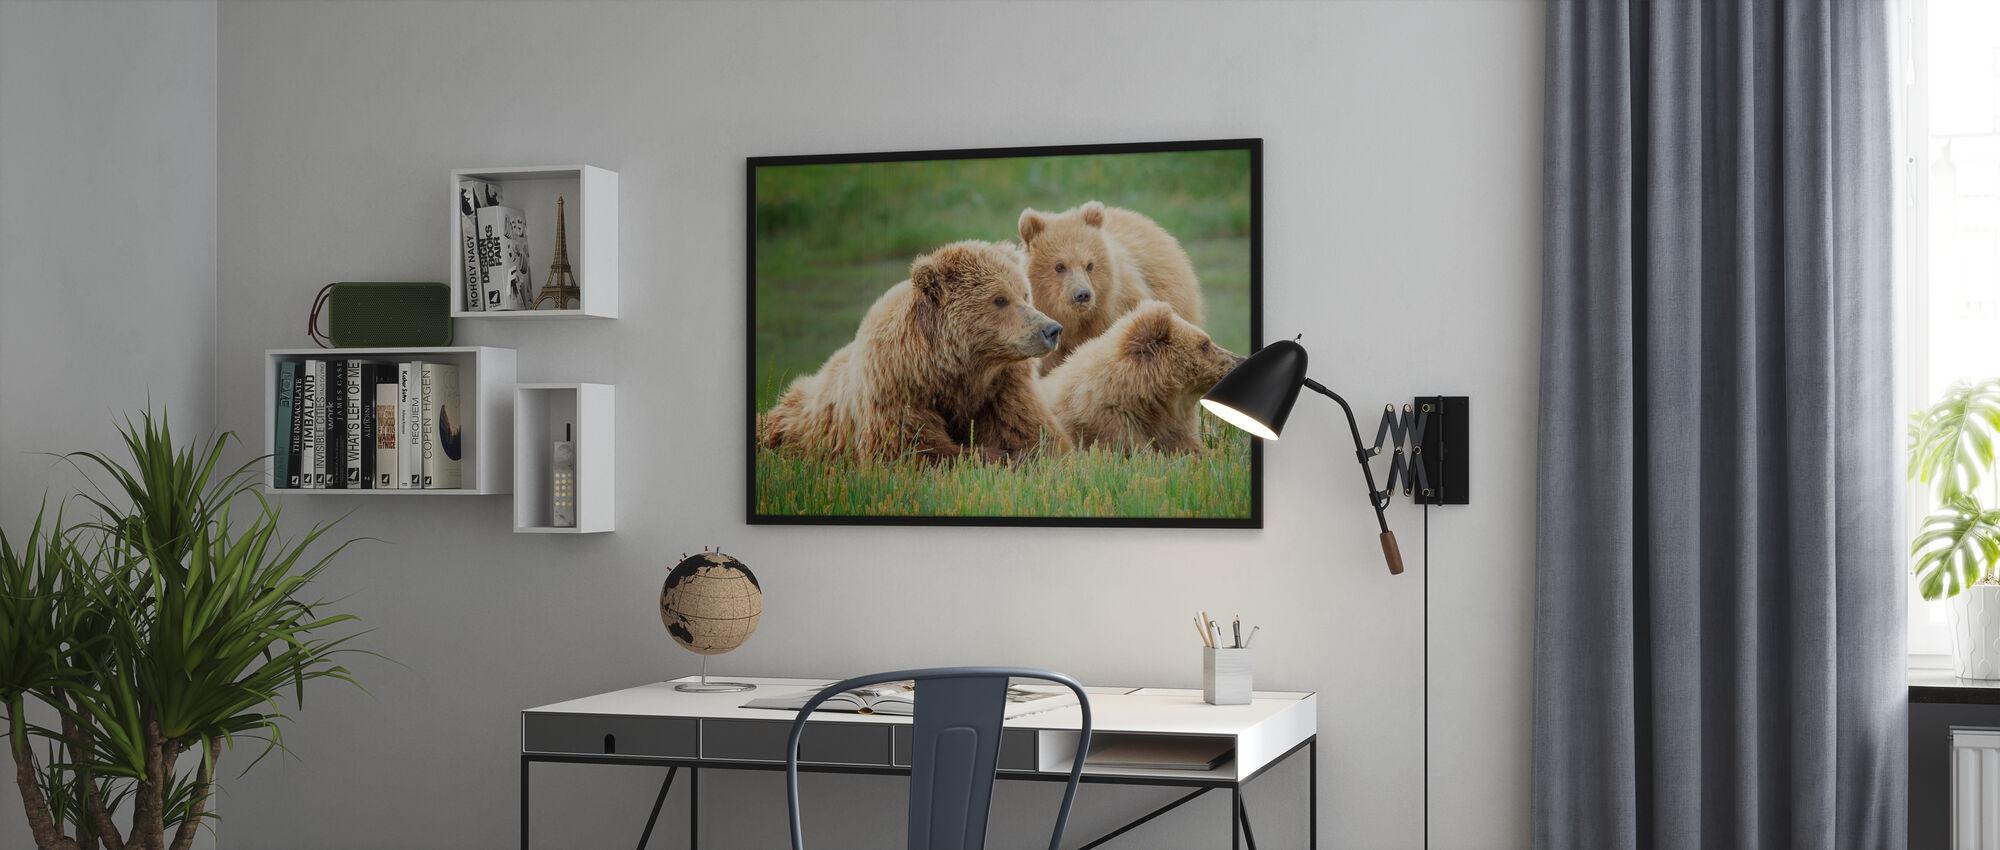 Bear Life II - Poster - Office